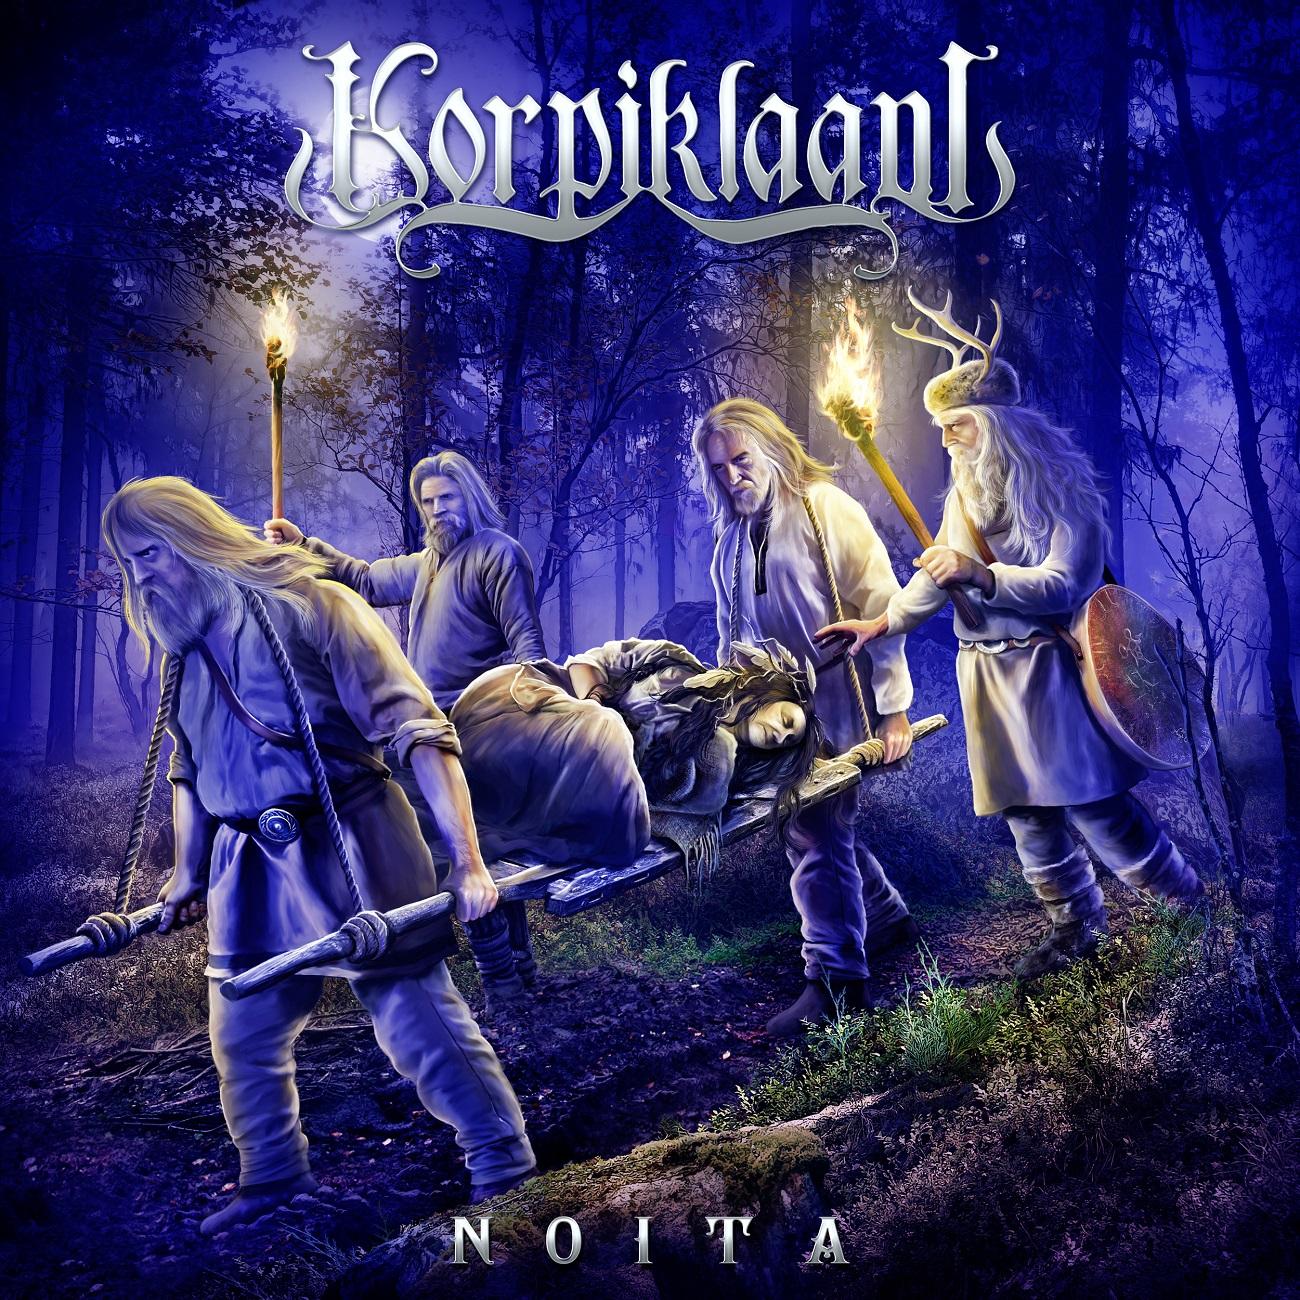 Korpiklaani – Noita Review